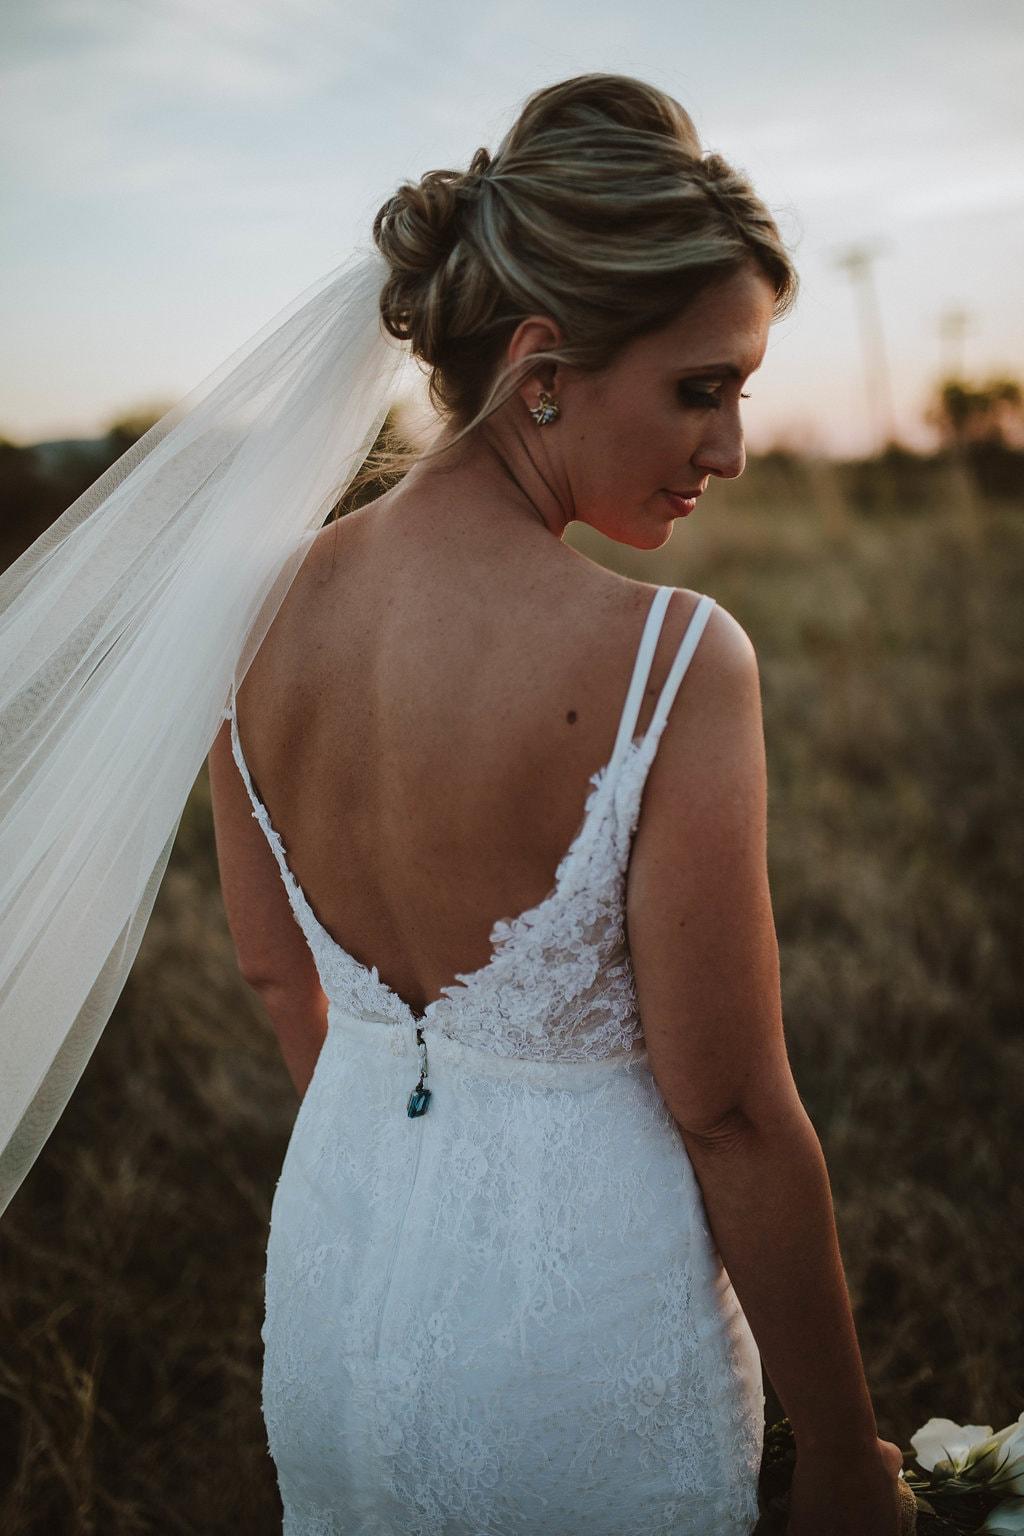 Kobus Dippenaar Low Back Wedding Dress with Heirloom Jewel | Image: Jessica J Photography